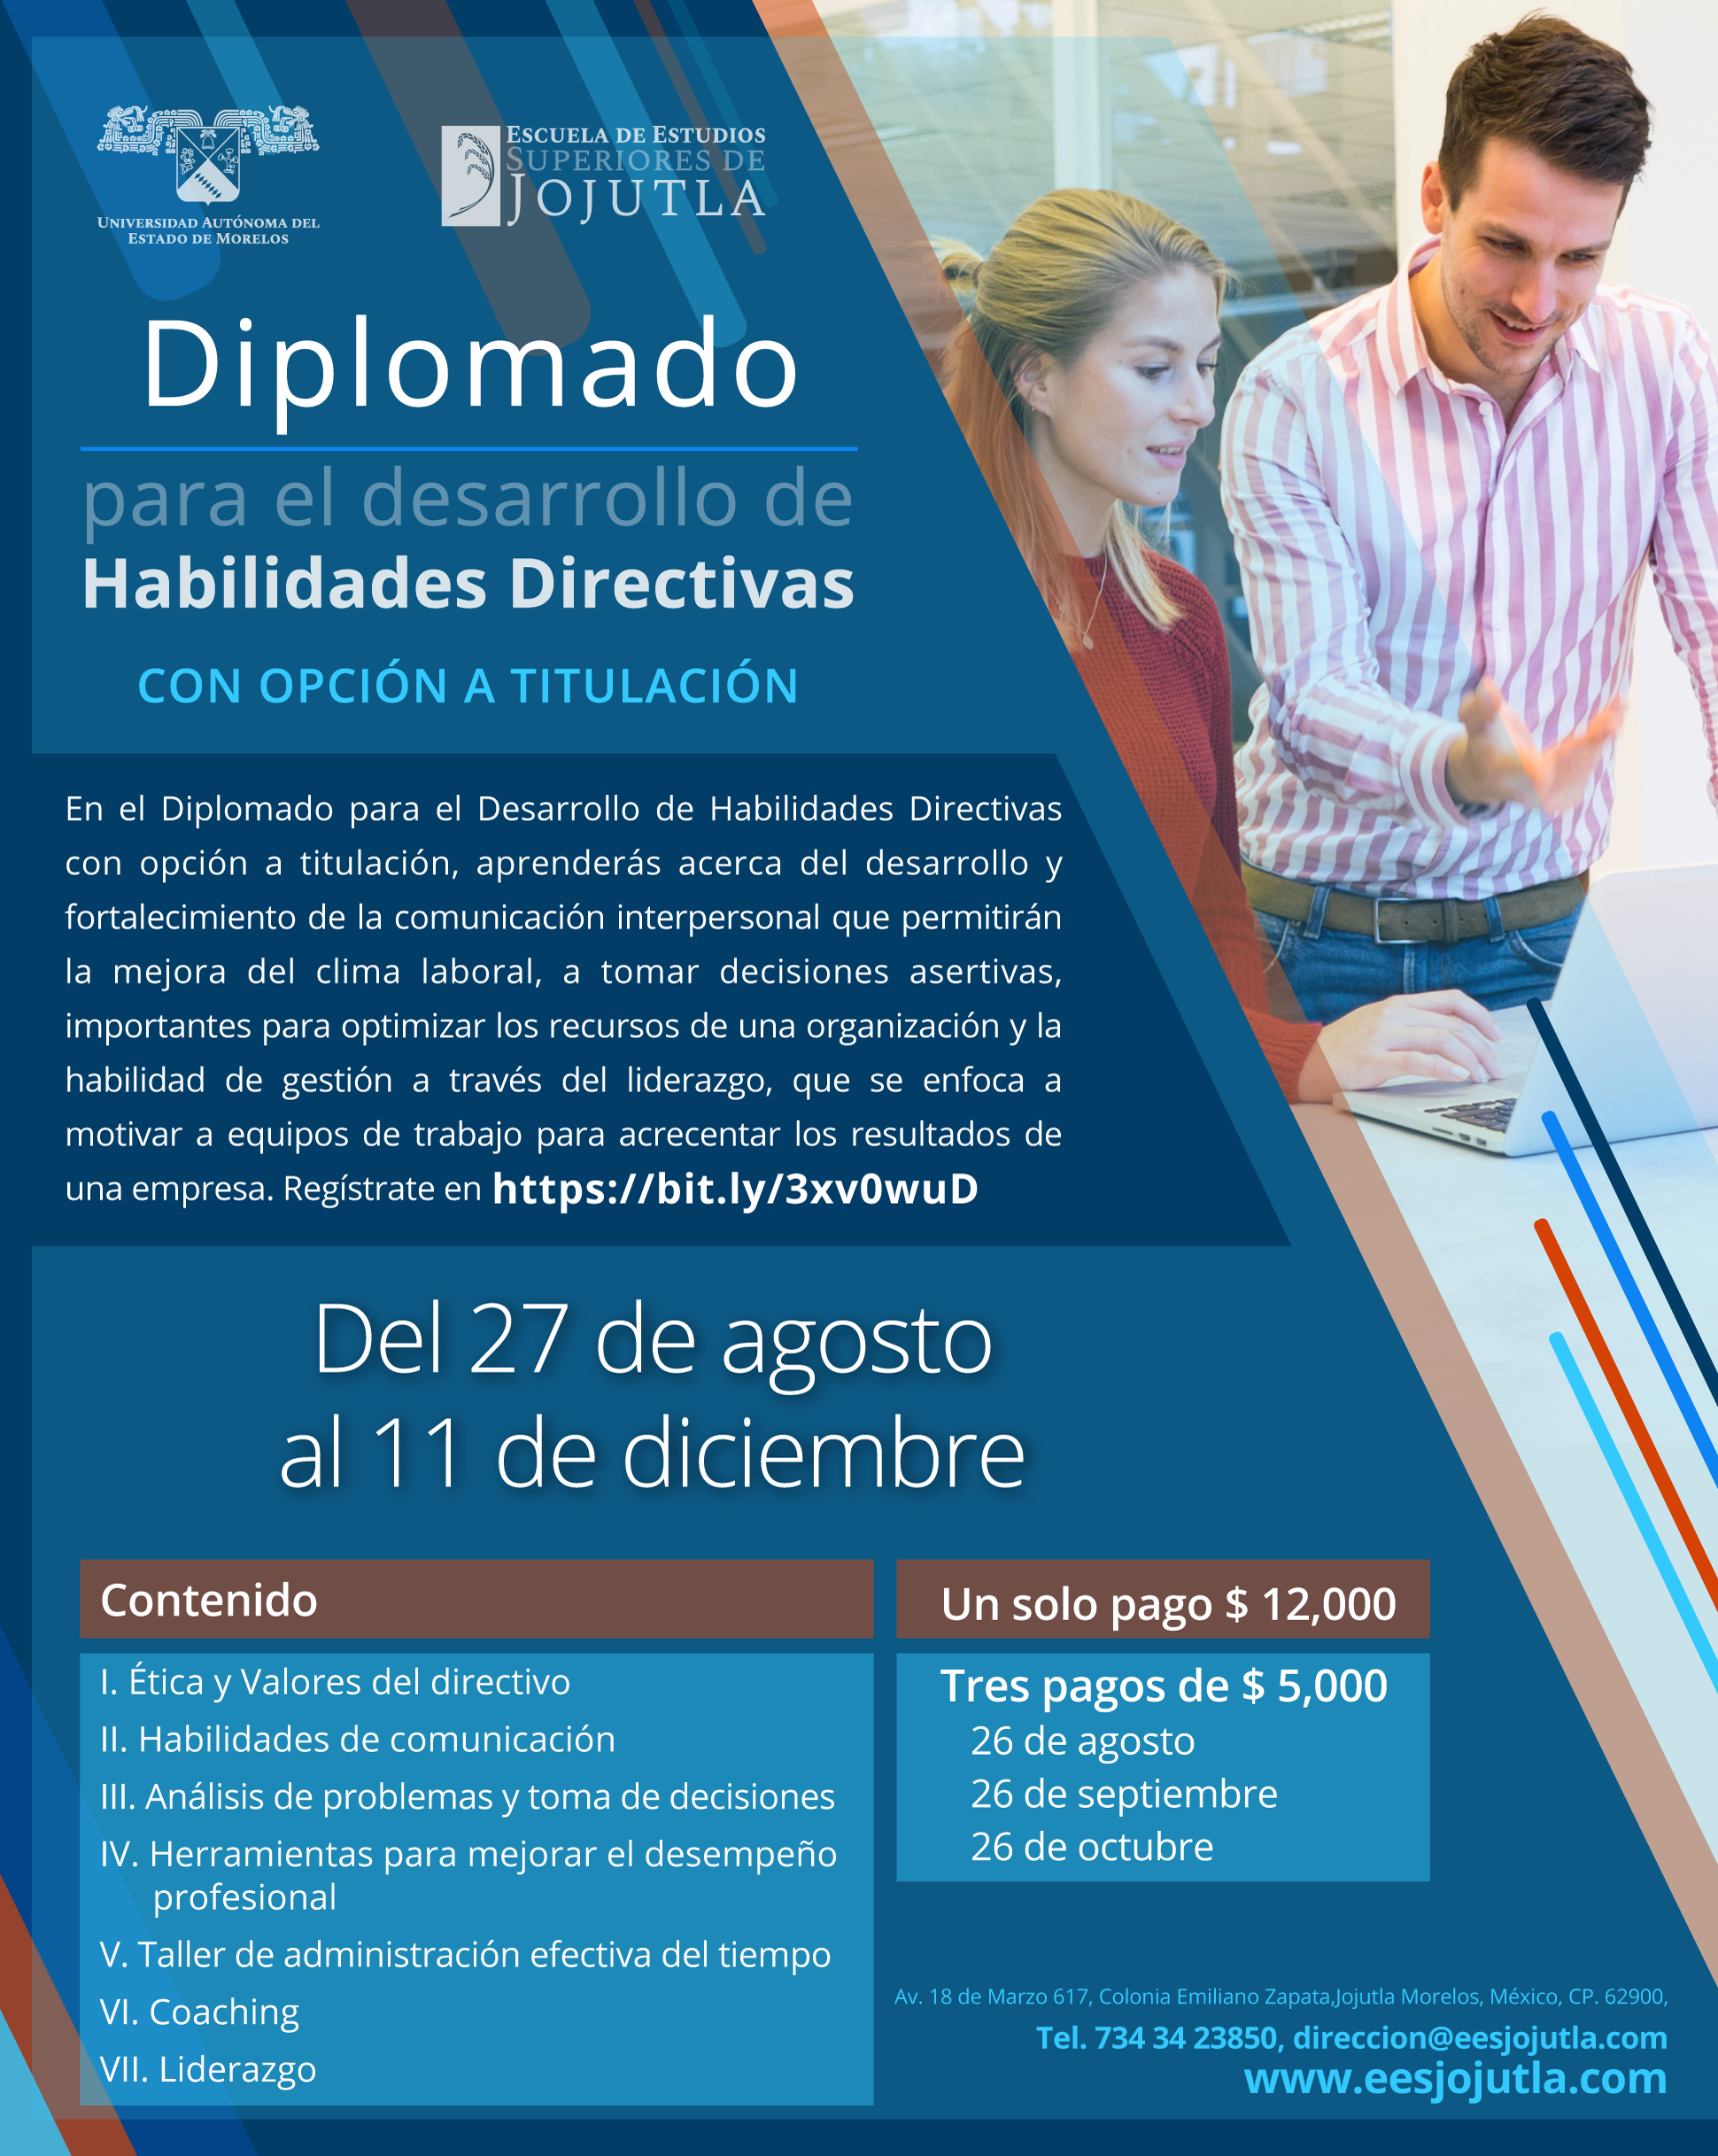 diplomado_2021-2022_cartel_info_gral_EESJojutla_08202021